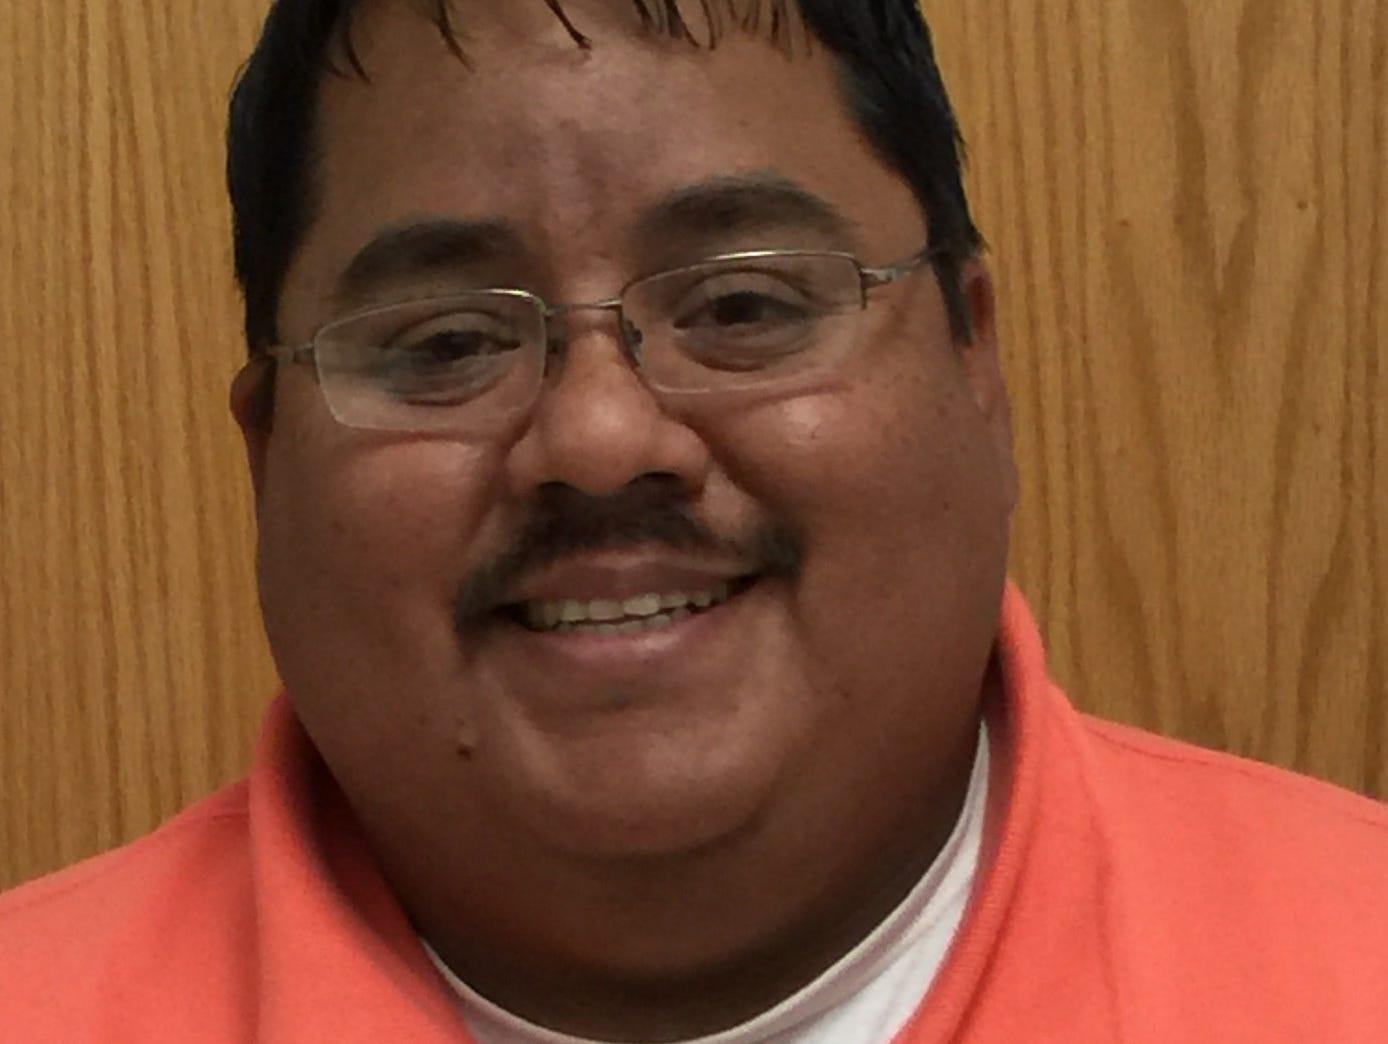 Michael Garcia, East Lee County